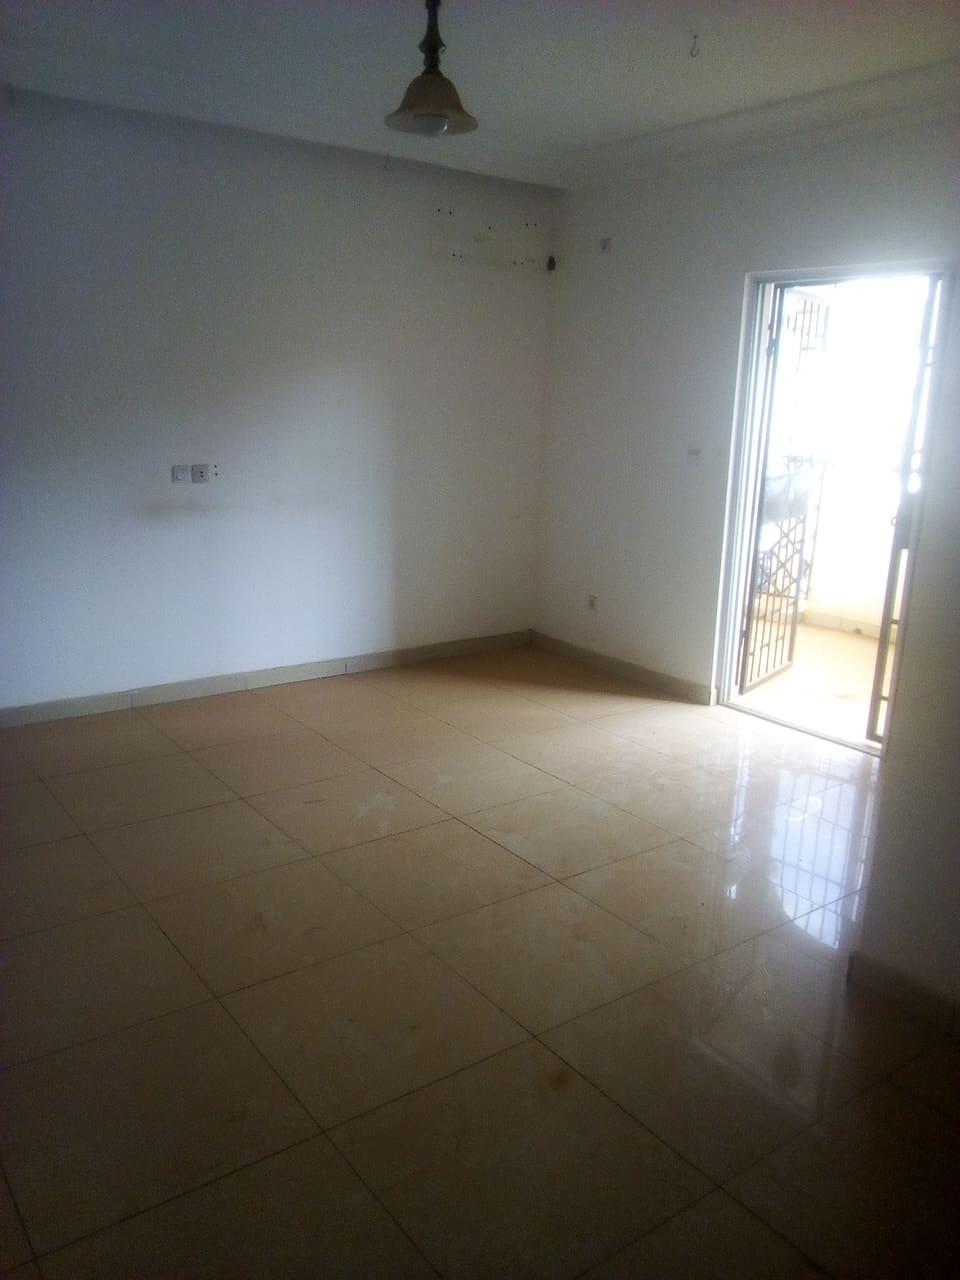 Apartment to rent - Yaoundé, Bastos, golf - 1 living room(s), 3 bedroom(s), 4 bathroom(s) - 700 000 FCFA / month